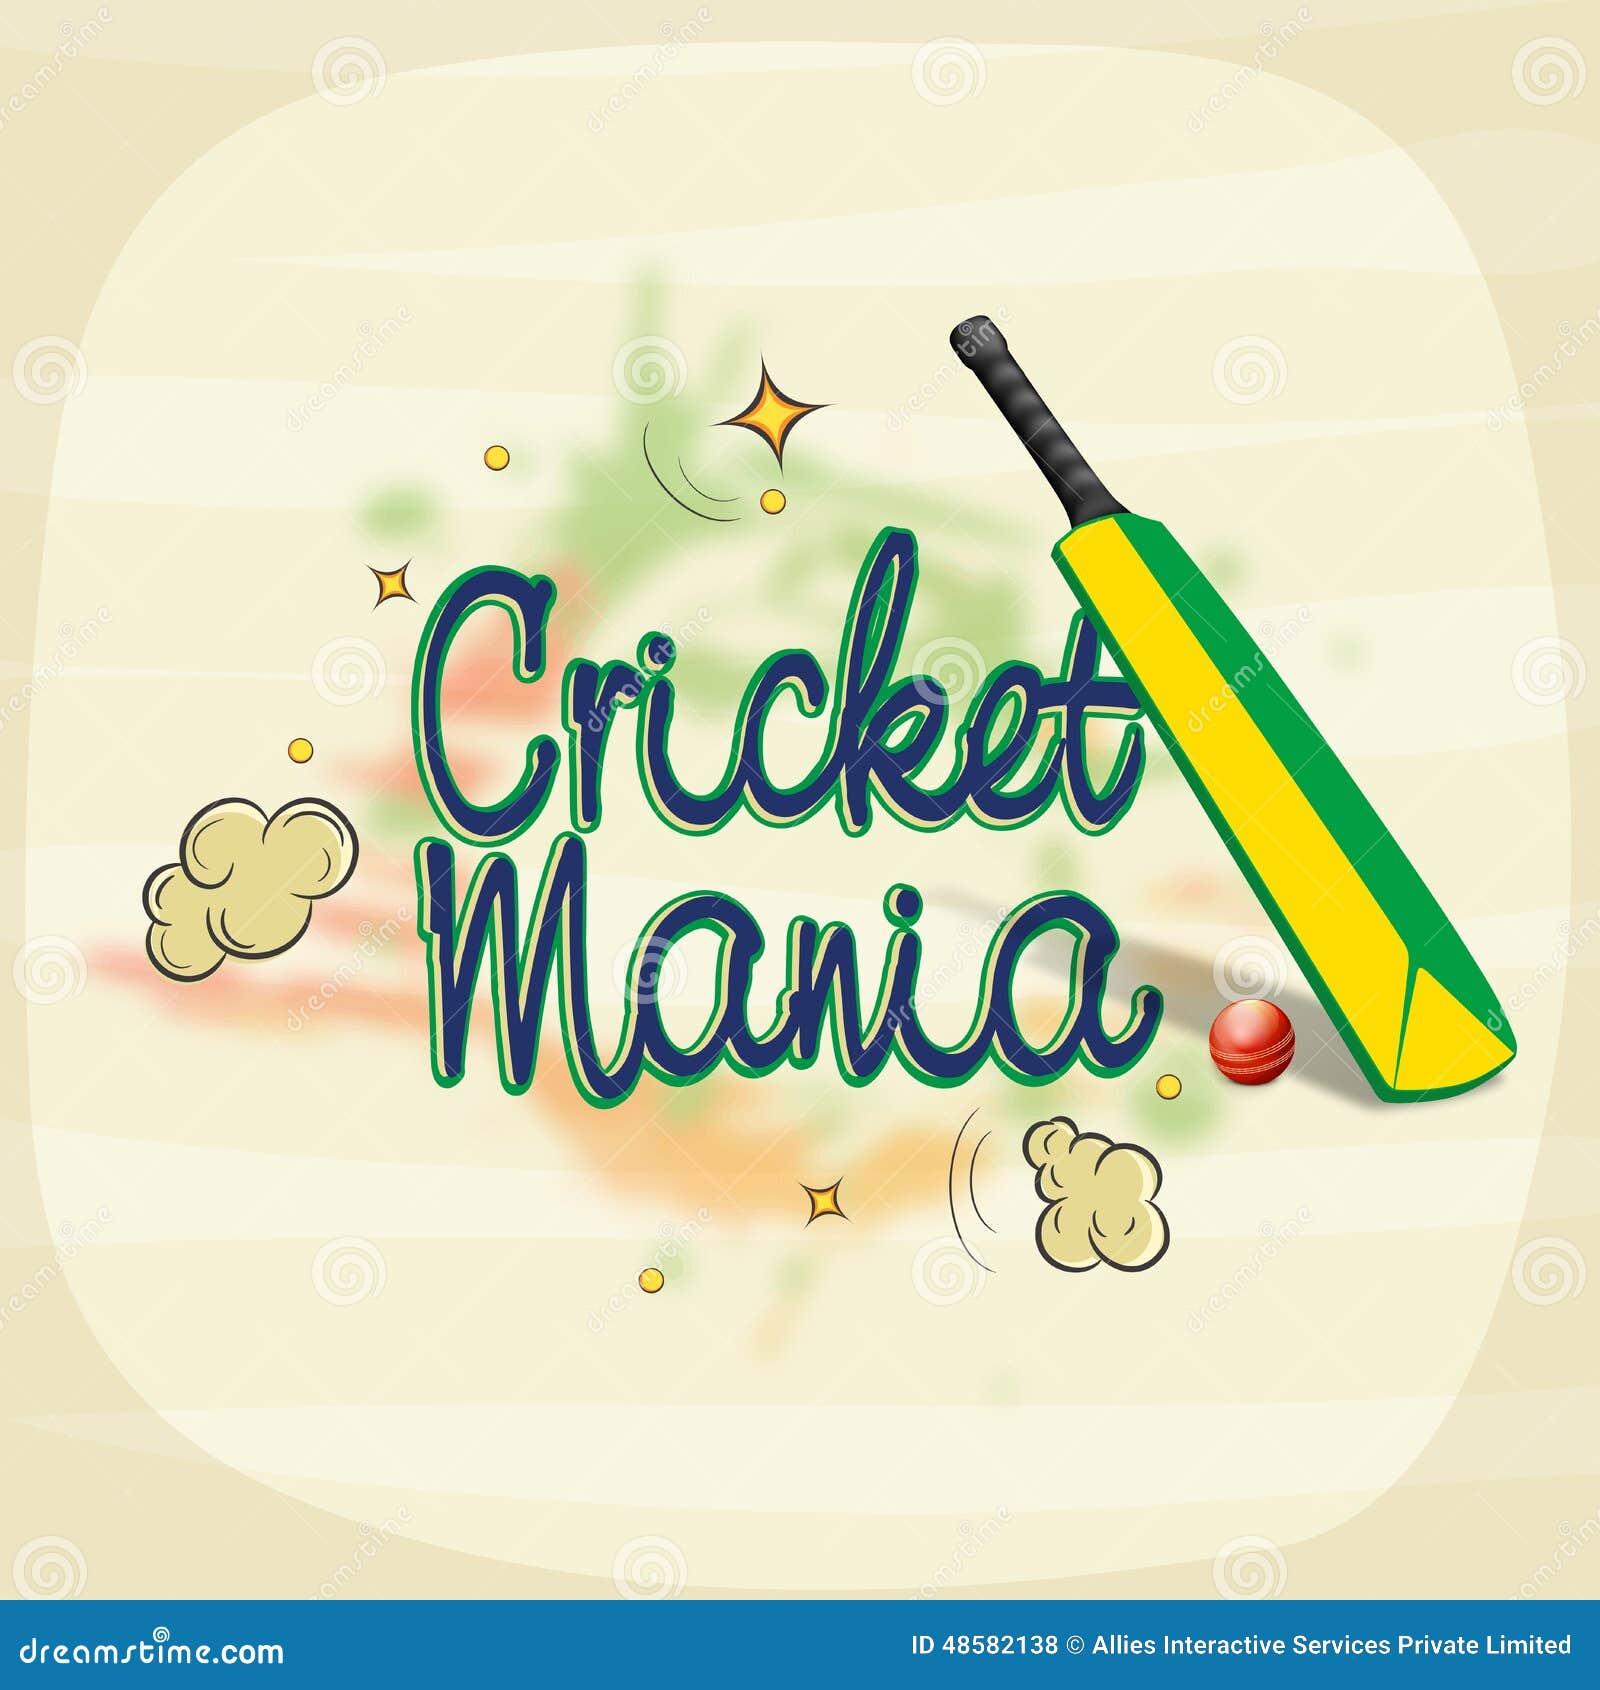 cricket in marathi Marathi essay writing academic writing help an advantageous etn noticias  essay on my favourite game cricket in marathi essay service my hobby singing .